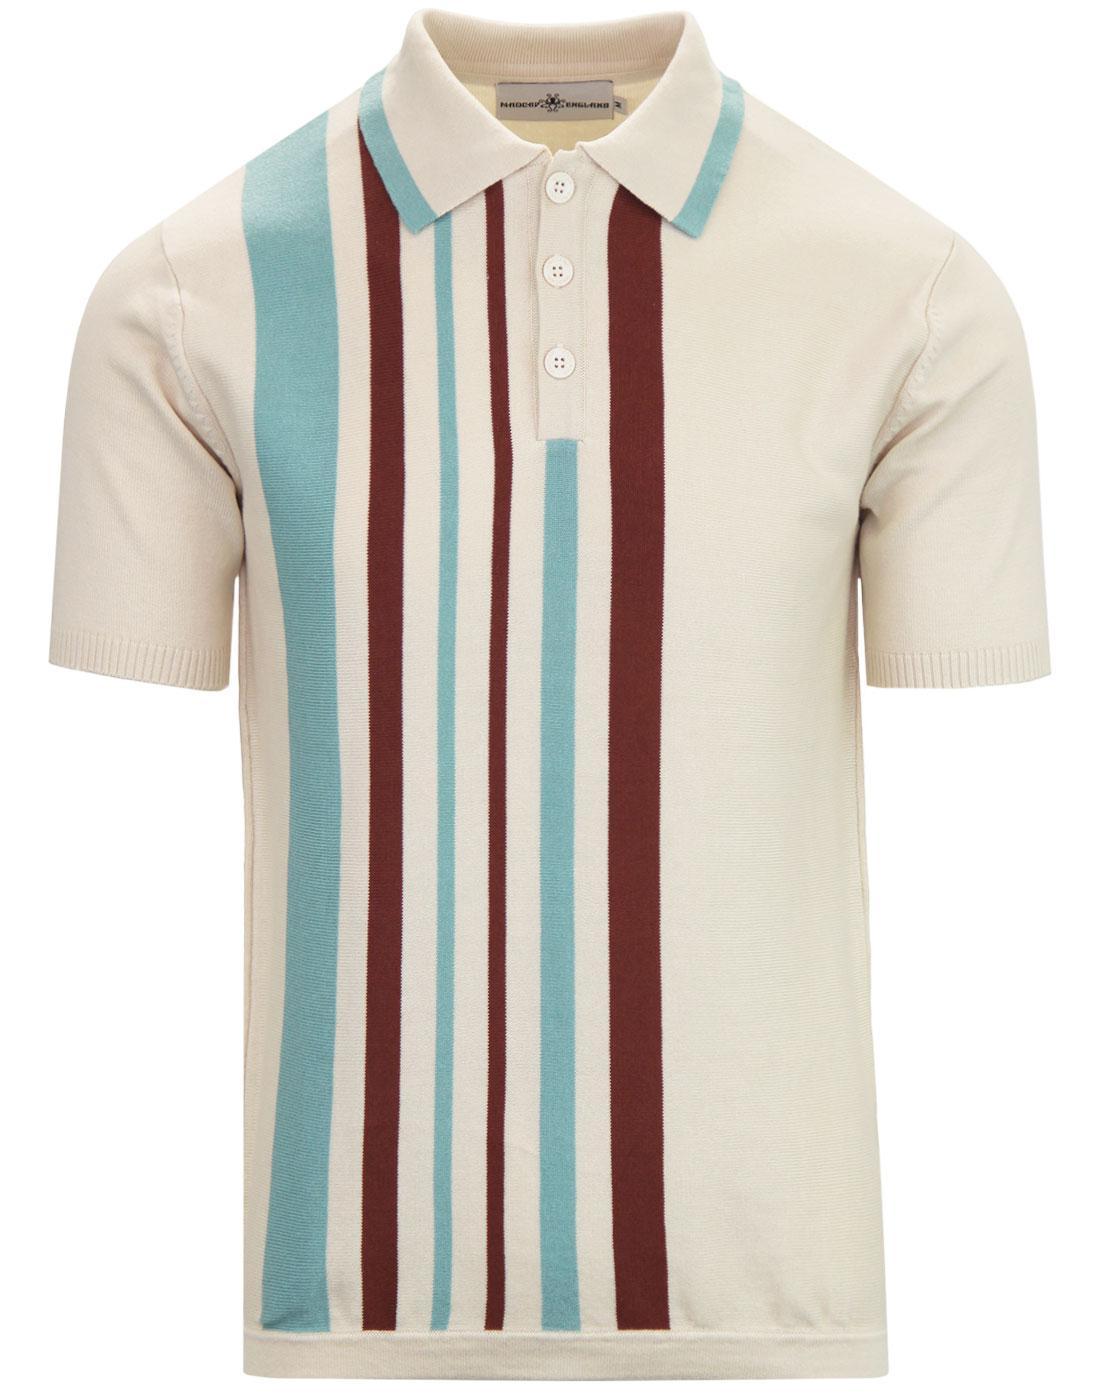 Bauhaus MADCAP ENGLAND Mod Stripe Knit Polo Shirt